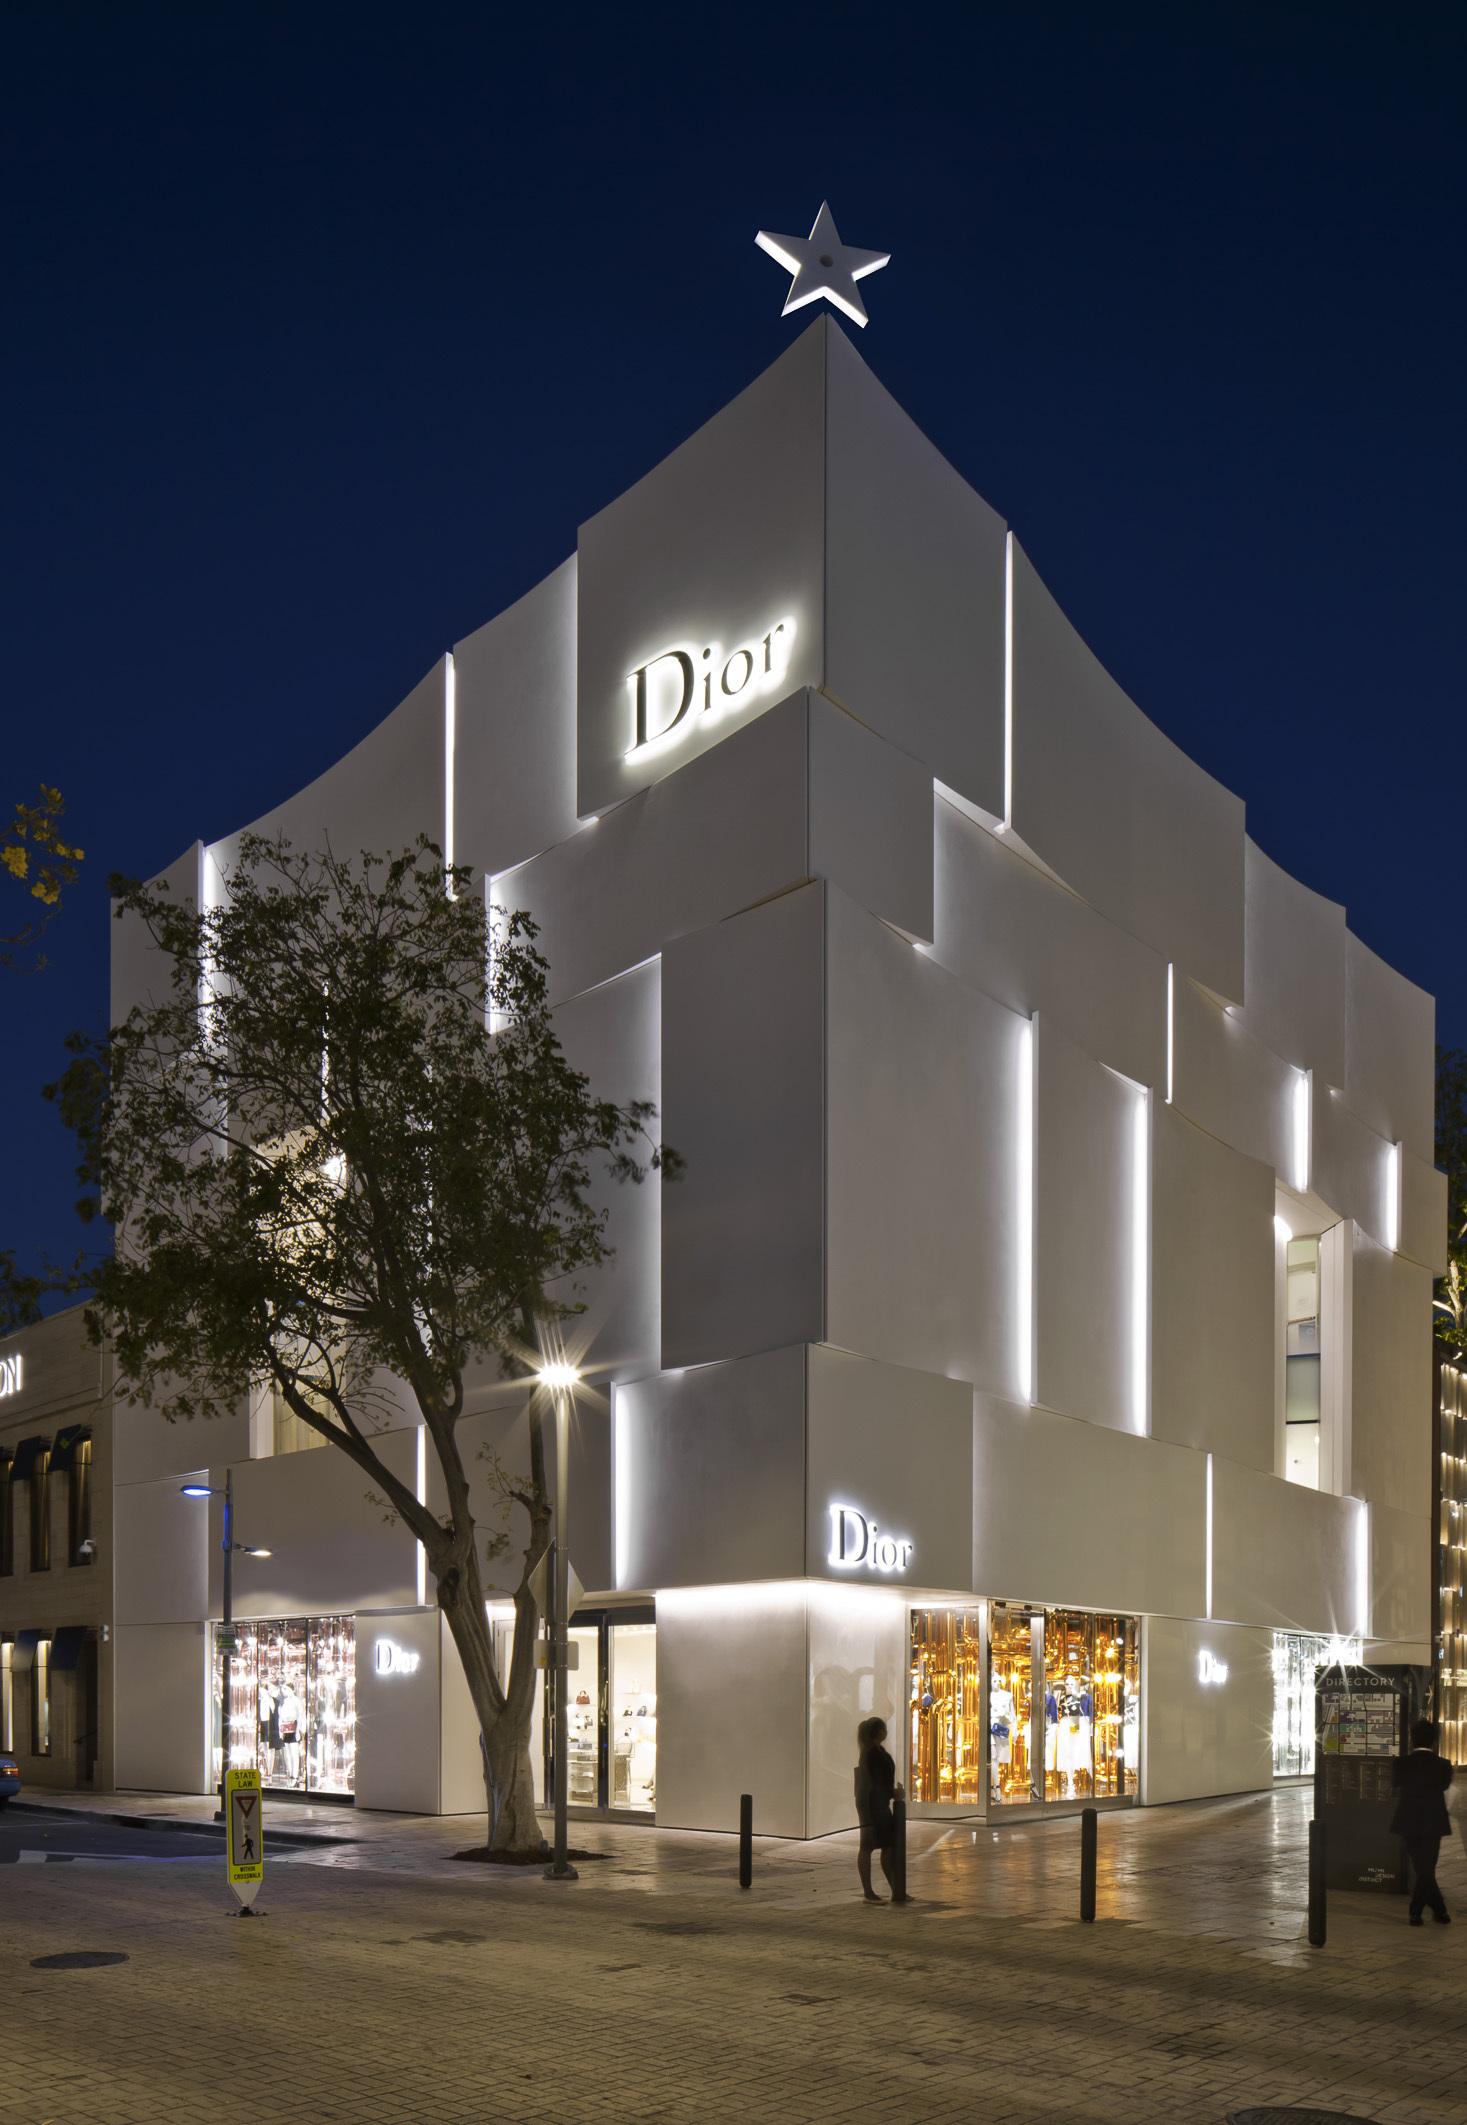 Dior Miami Facade Barbaritobancel Architectes Archdaily